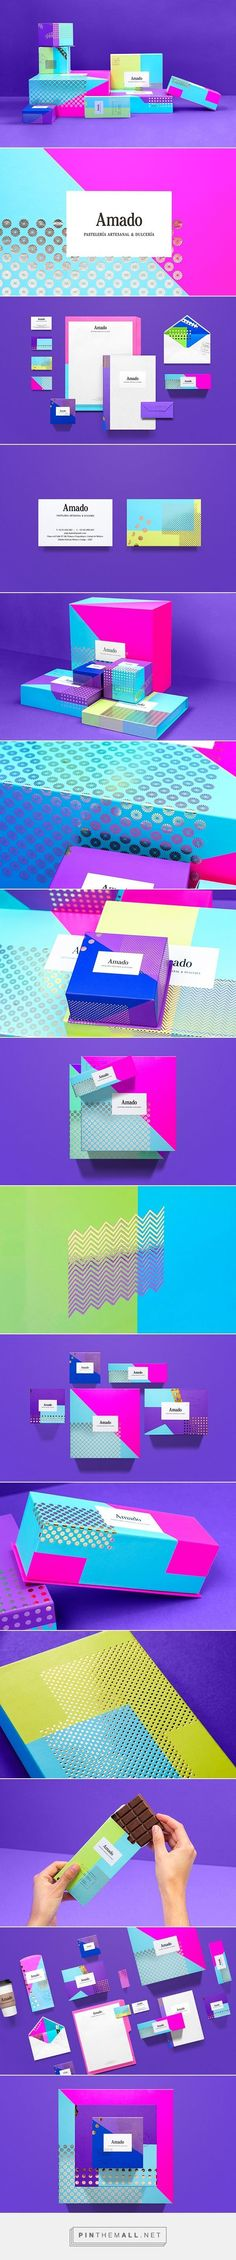 Amado / Corporate Design / Bäckerei / Anagrama .